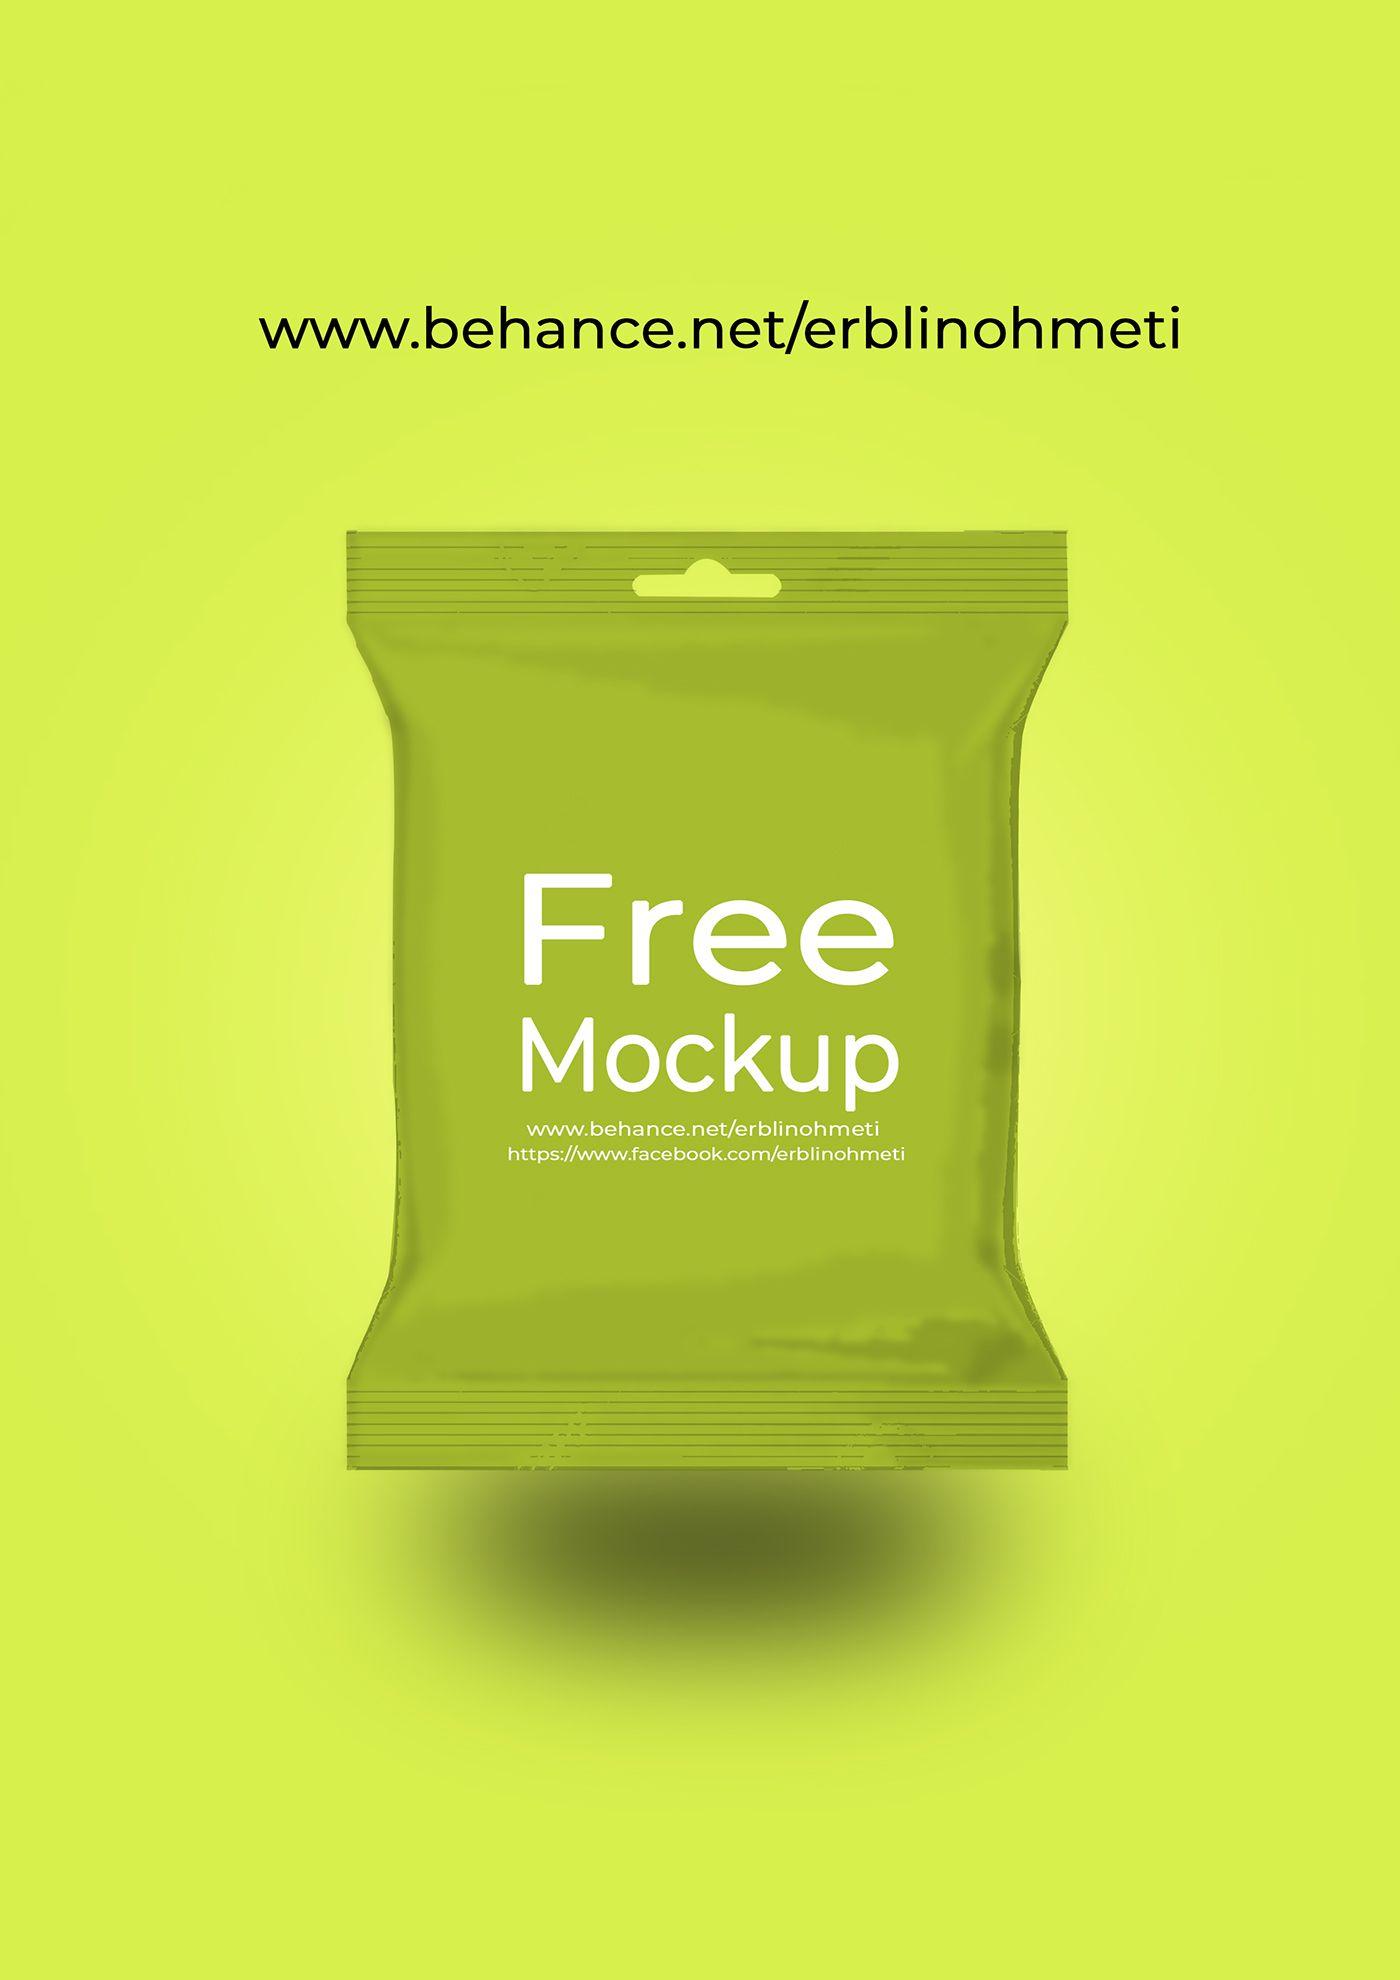 Download Free Psd Food Packaging Mockup On Behance Packaging Mockup Food Packaging Mockup